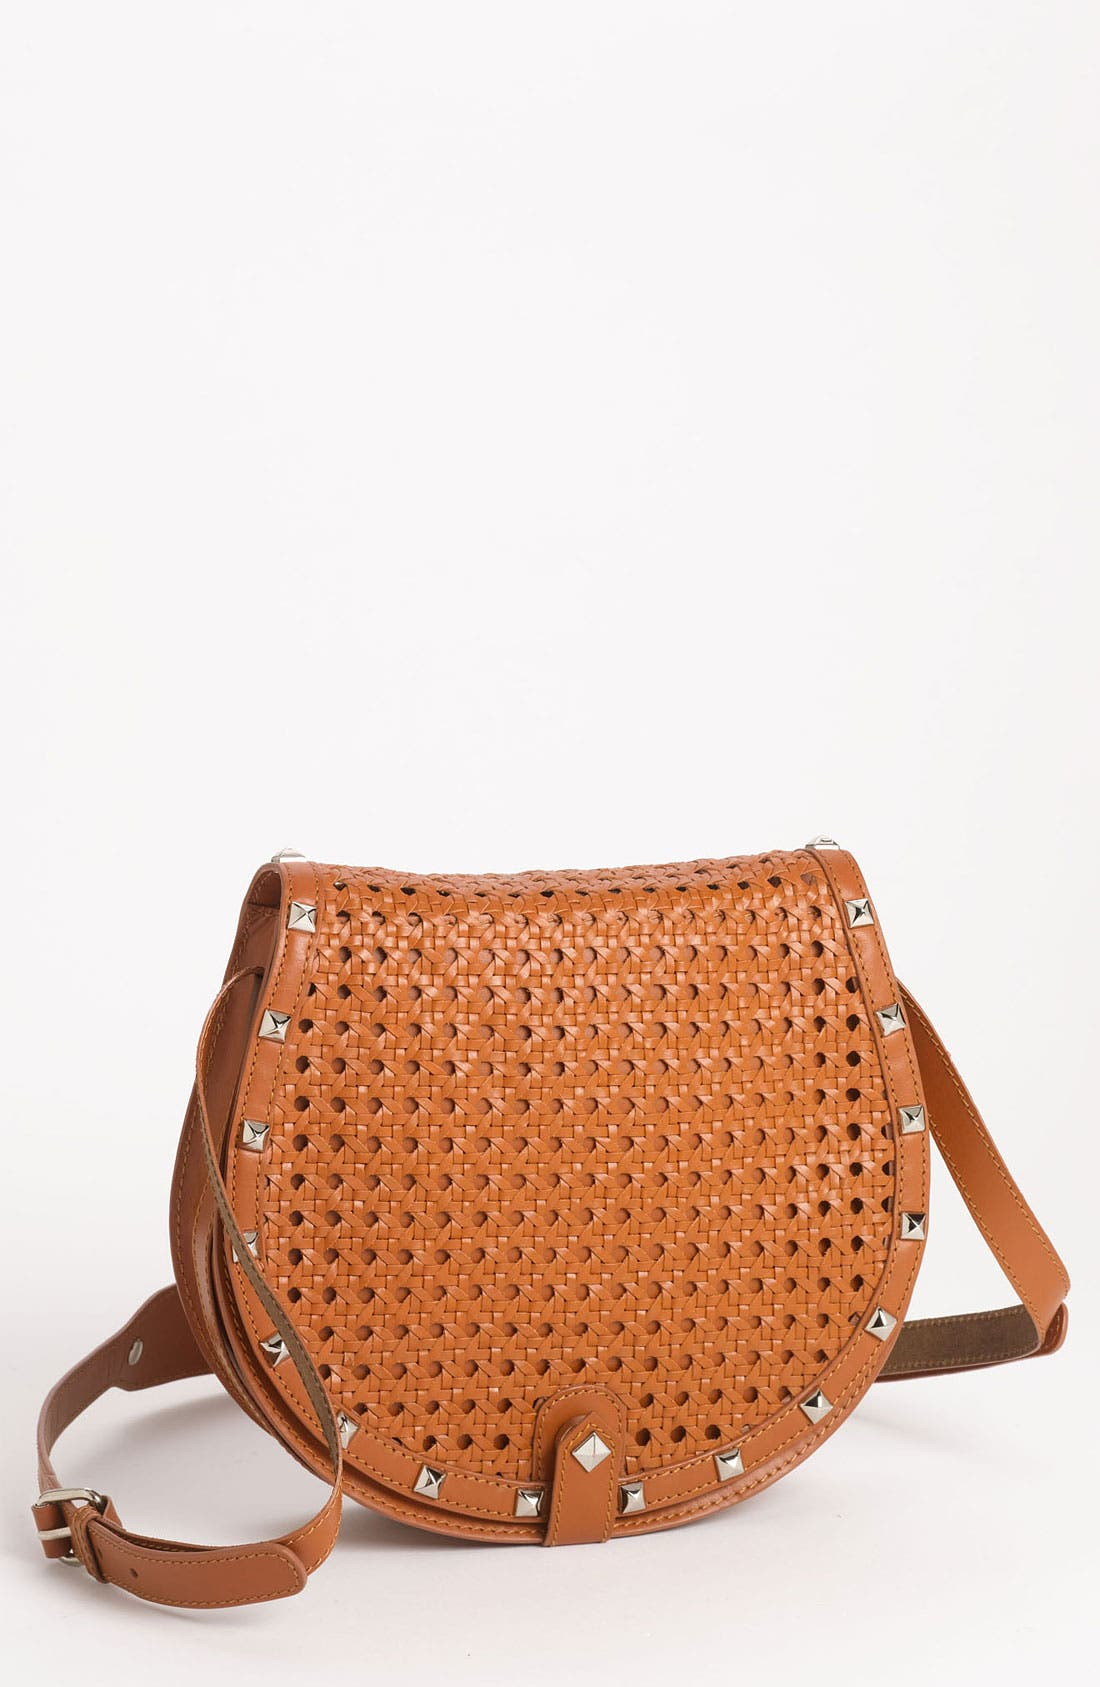 Main Image - Rebecca Minkoff 'Skylar - Wicker Woven' Leather Crossbody Bag